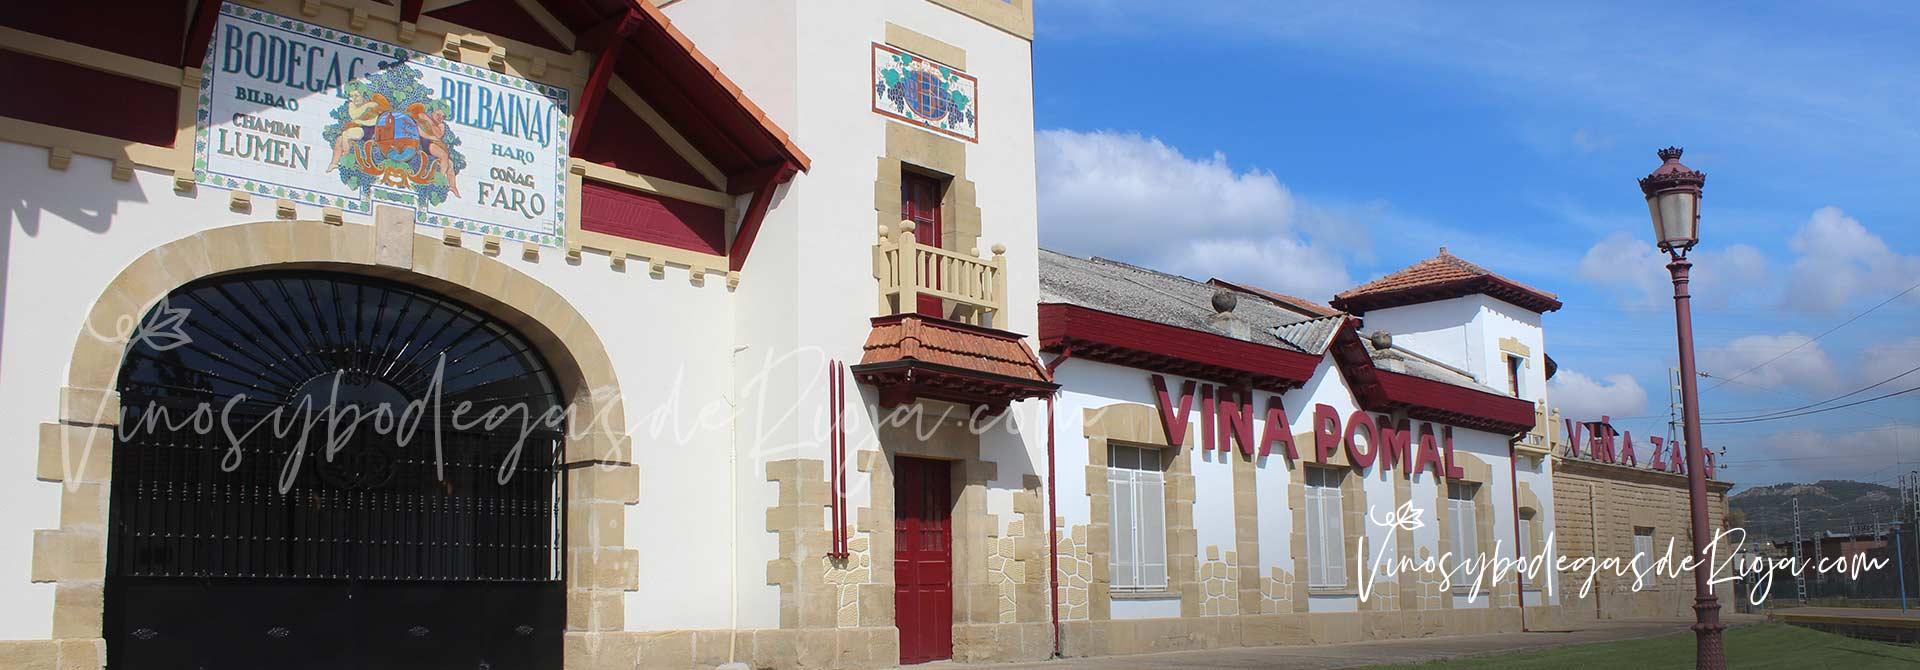 Bodegas Bilbaínas (Haro, Rioja Alta)